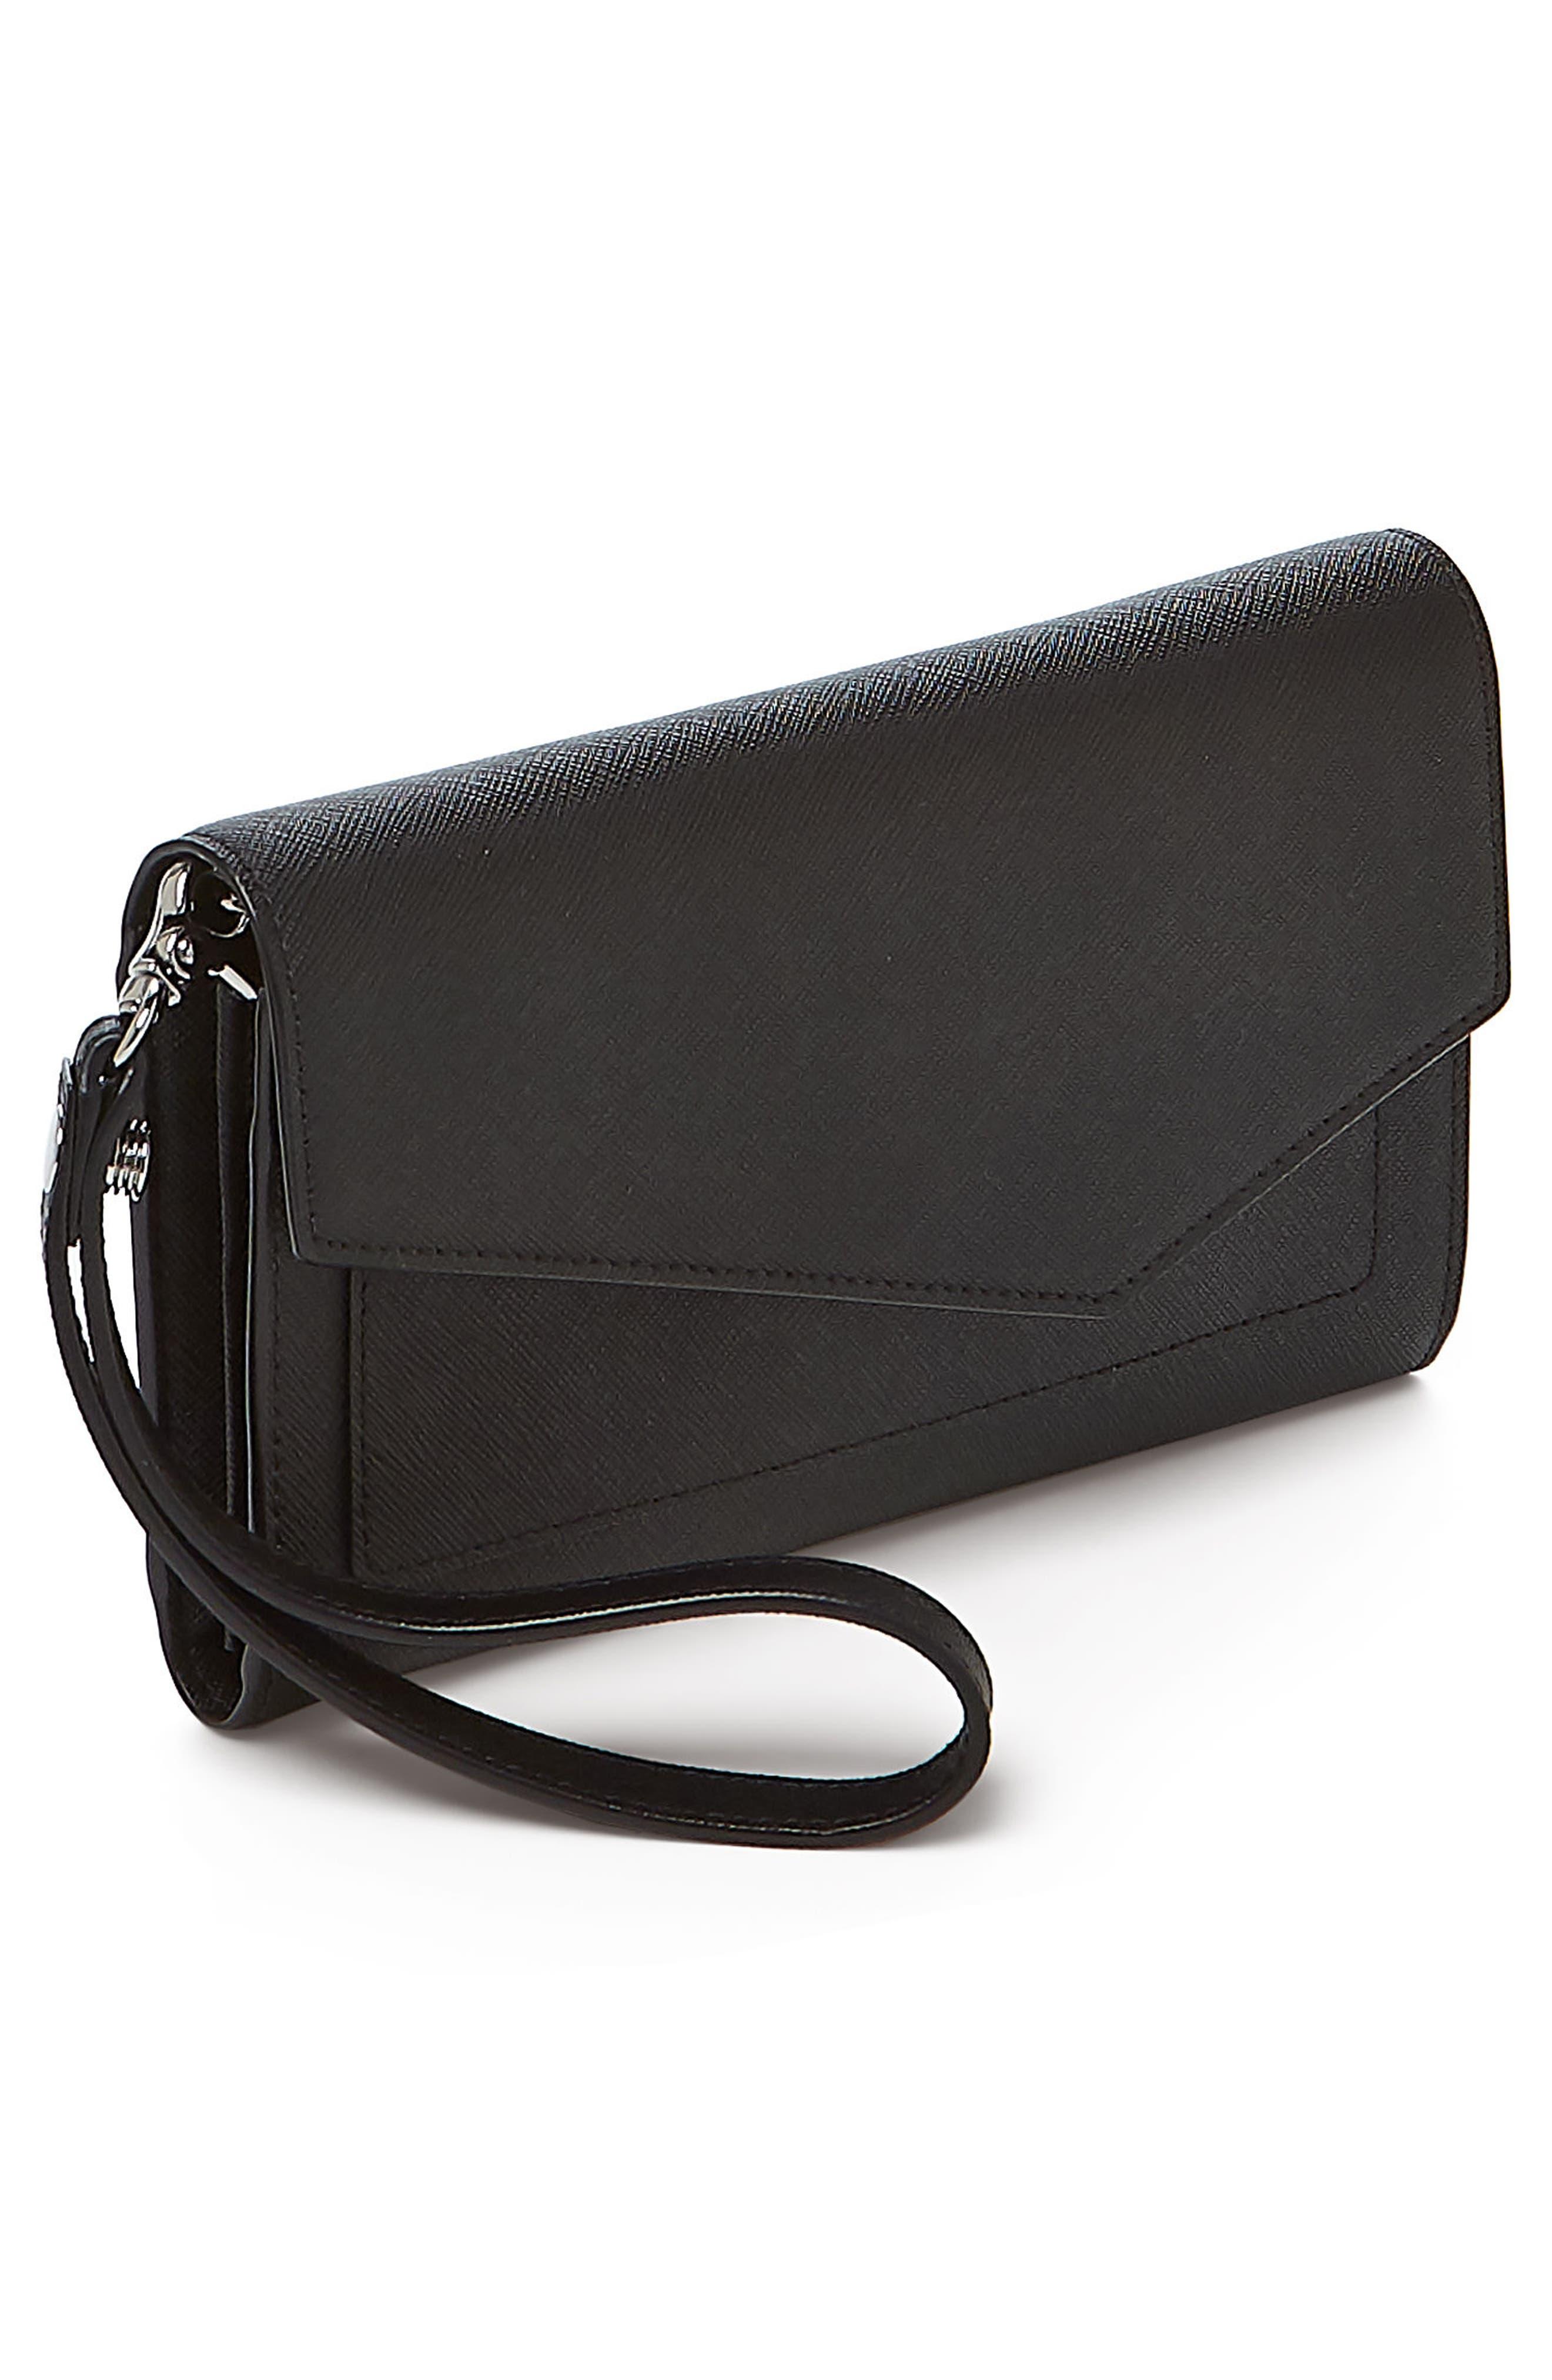 Cobble Hill Calfskin Leather Wallet,                             Alternate thumbnail 4, color,                             Black